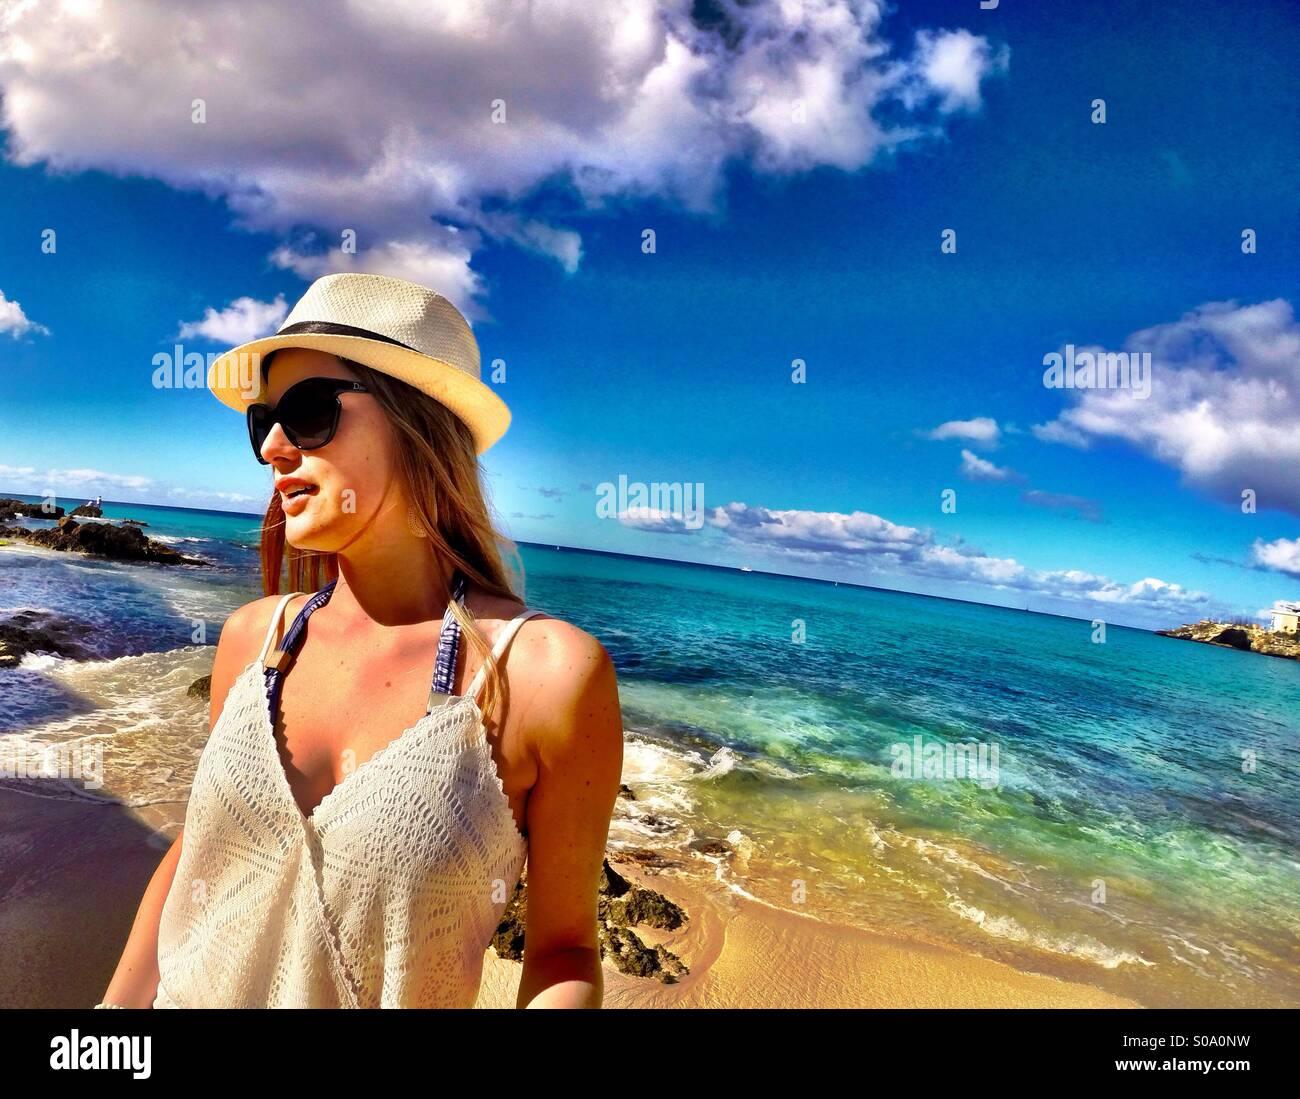 Estilo de vida caribeño - moda, relax, playa, tonos de azul Imagen De Stock